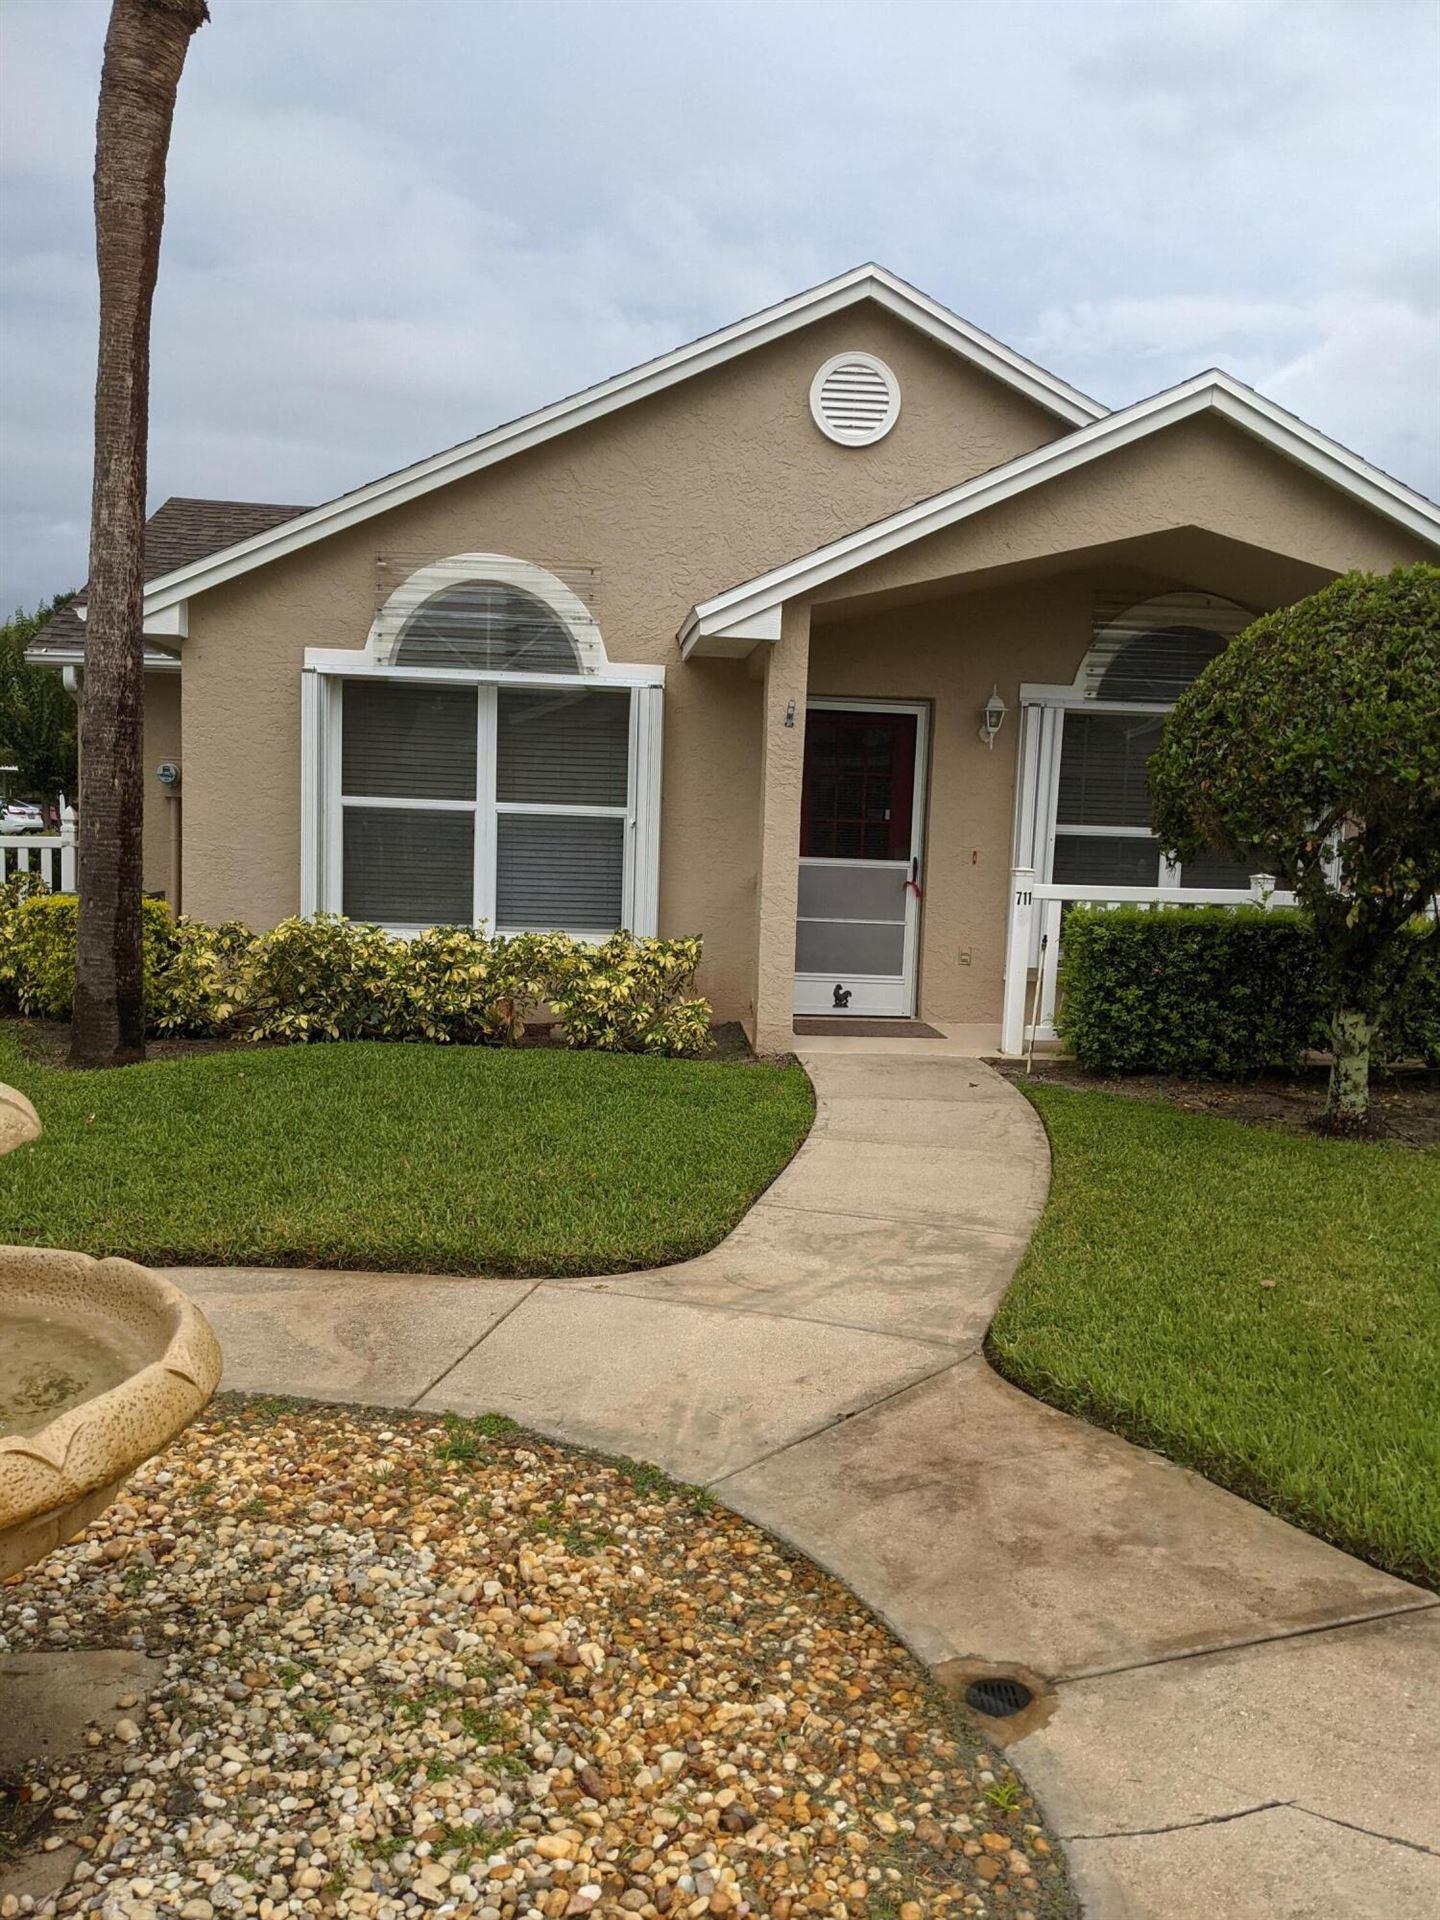 711 NW San Remo Circle, Port Saint Lucie, FL 34986 - MLS#: RX-10741543